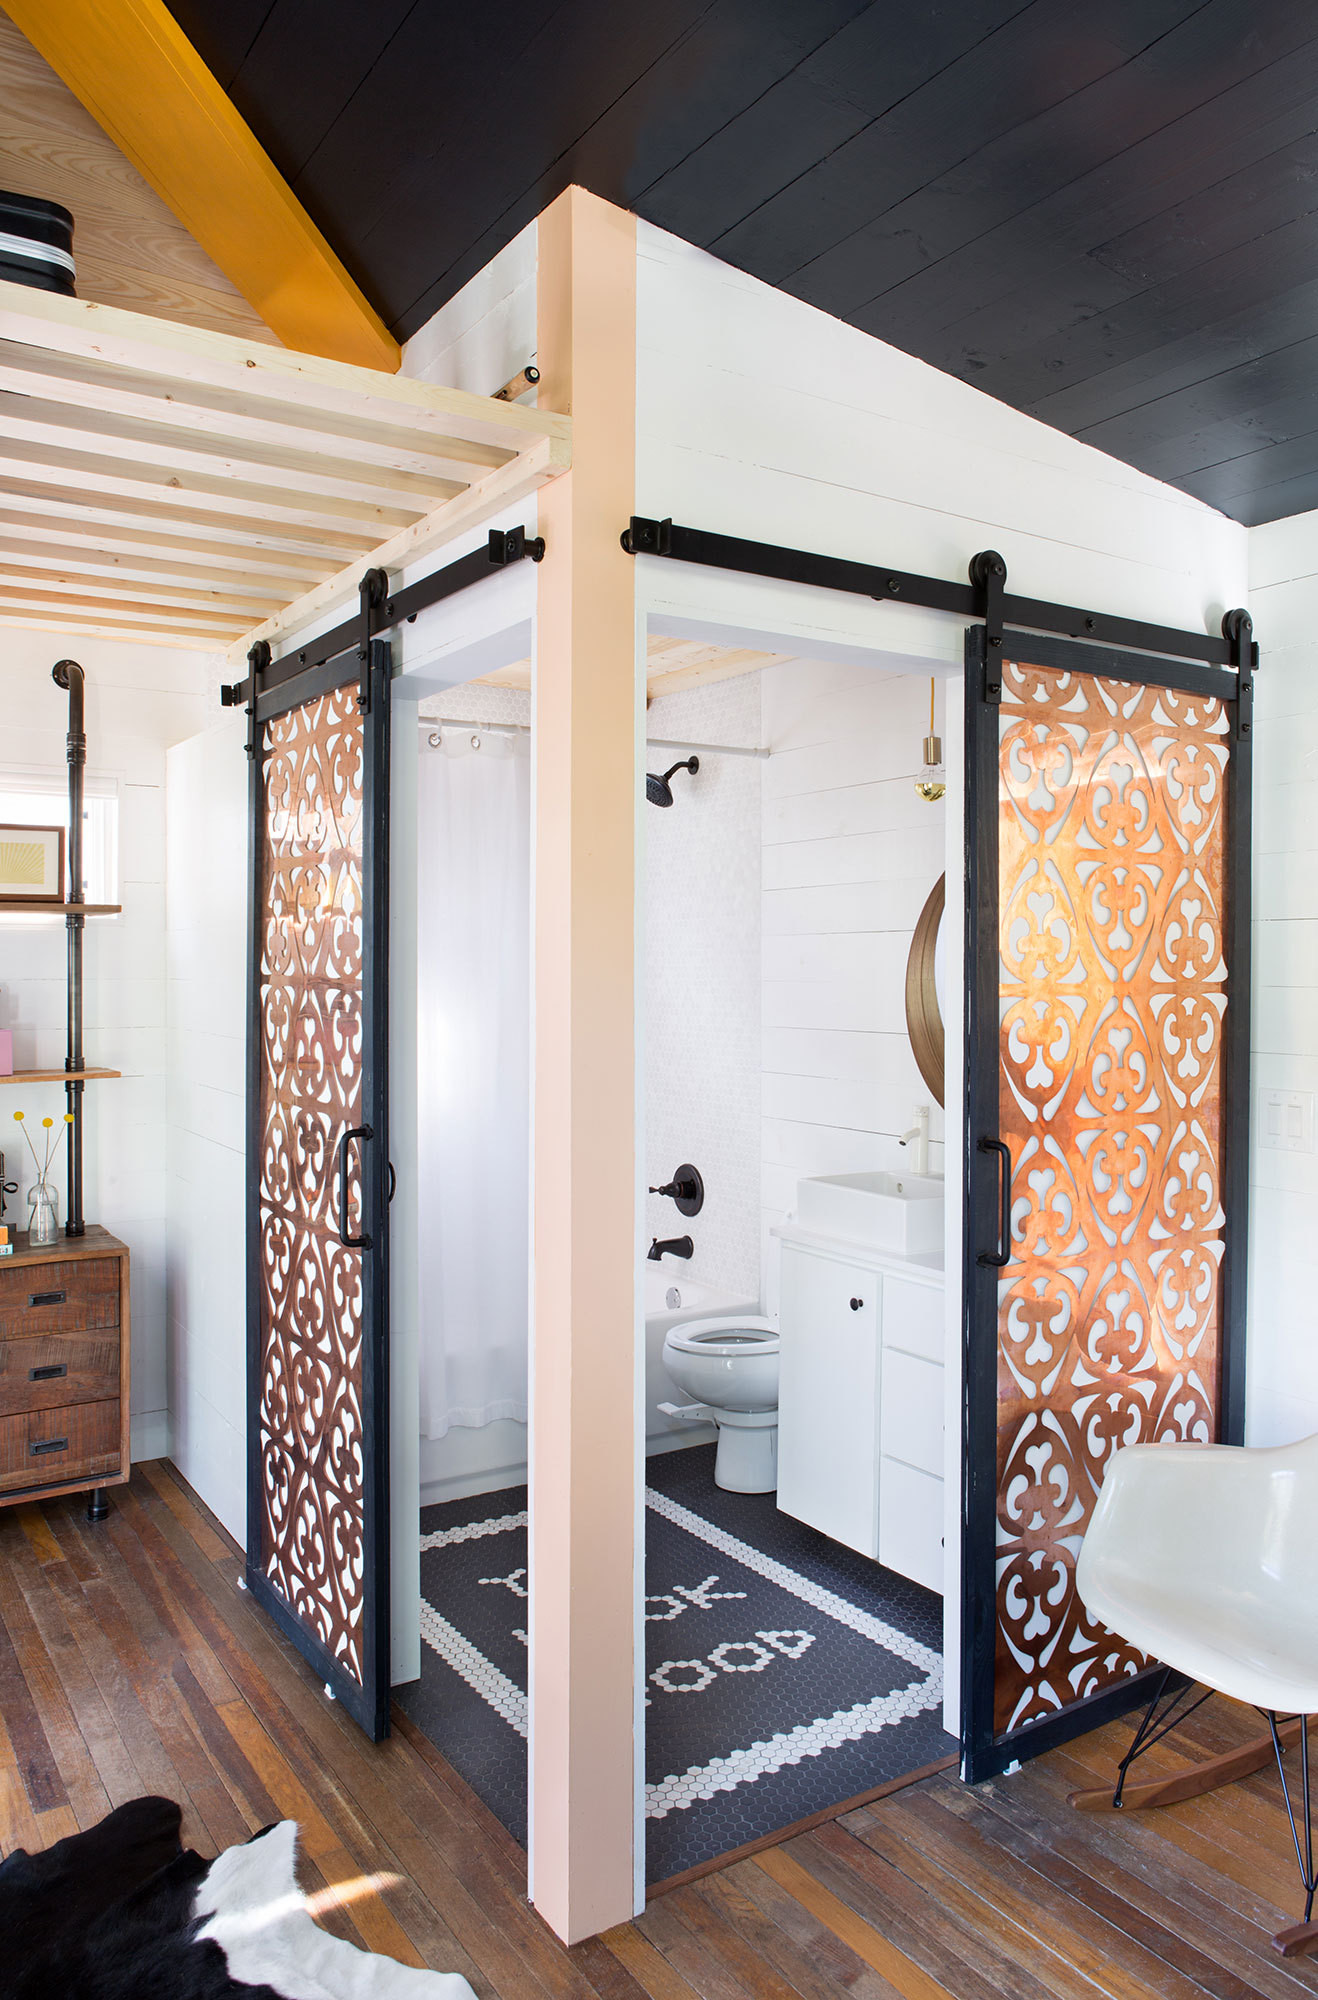 Copper Paneled Sliding Doors | Lonny Magazine Photo by Molly Winters